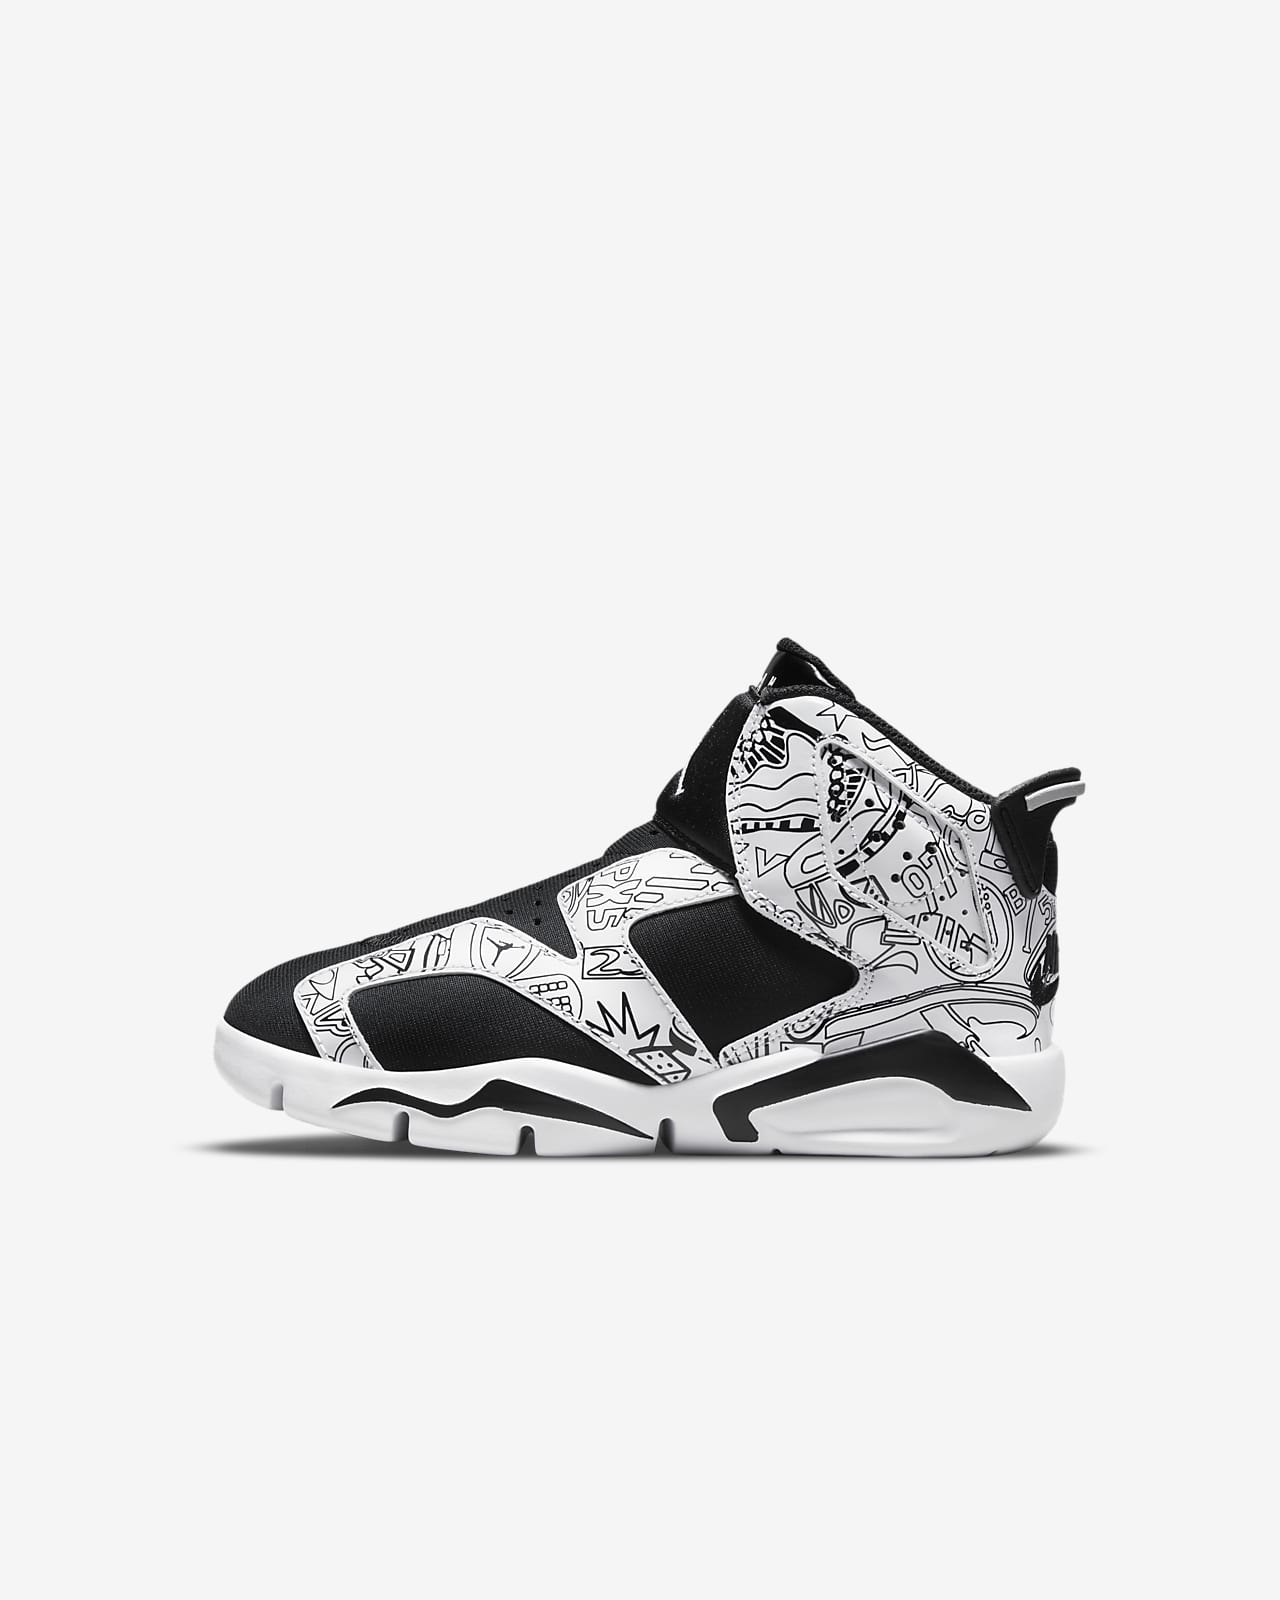 Jordan 6 Retro LTL Flex SE PS 复刻幼童运动童鞋